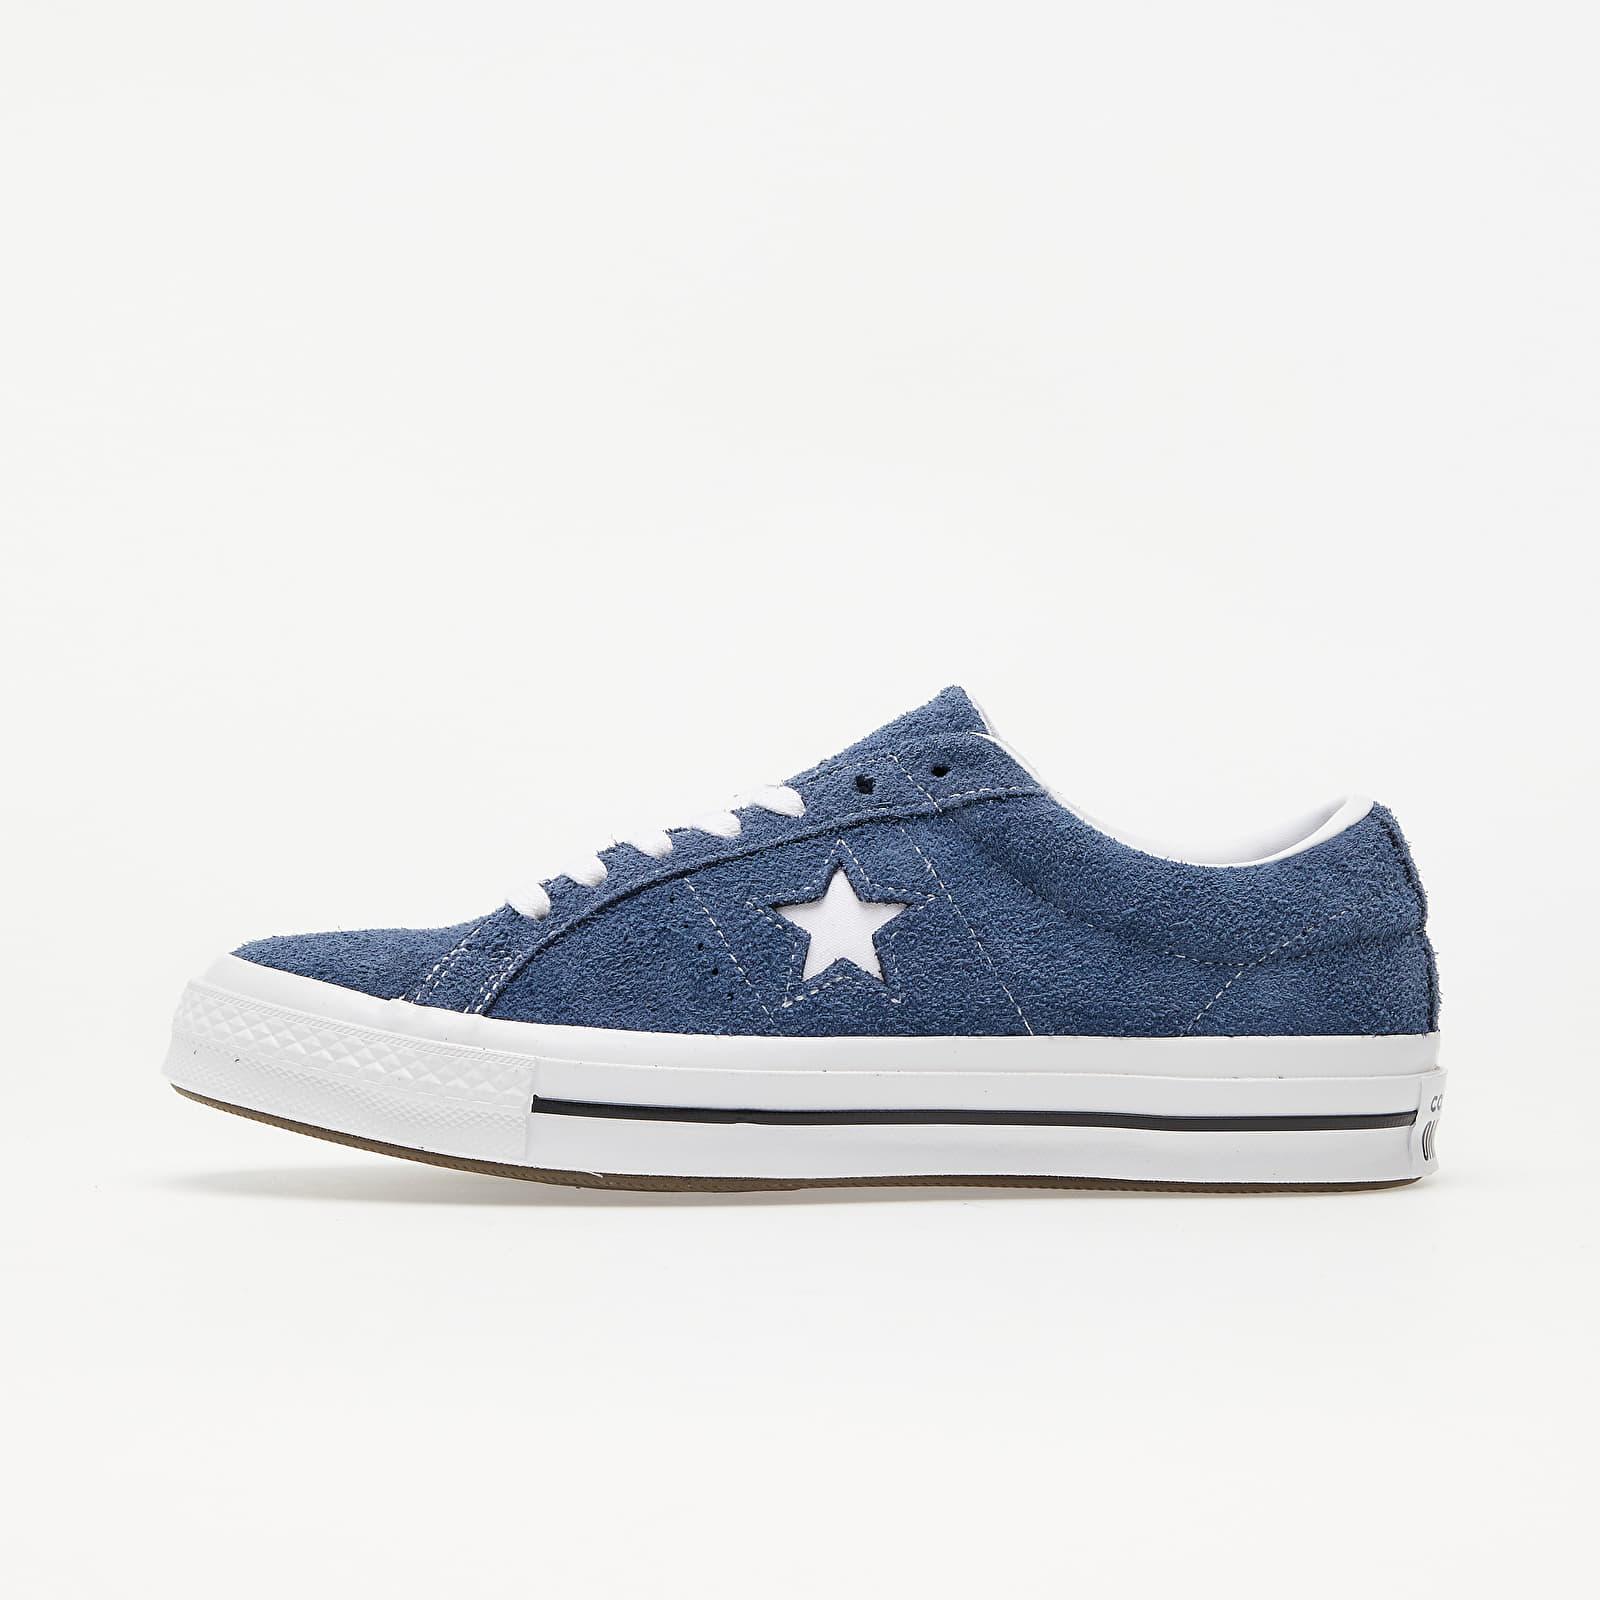 Converse One Star OX Navy/ White/ White 158371C